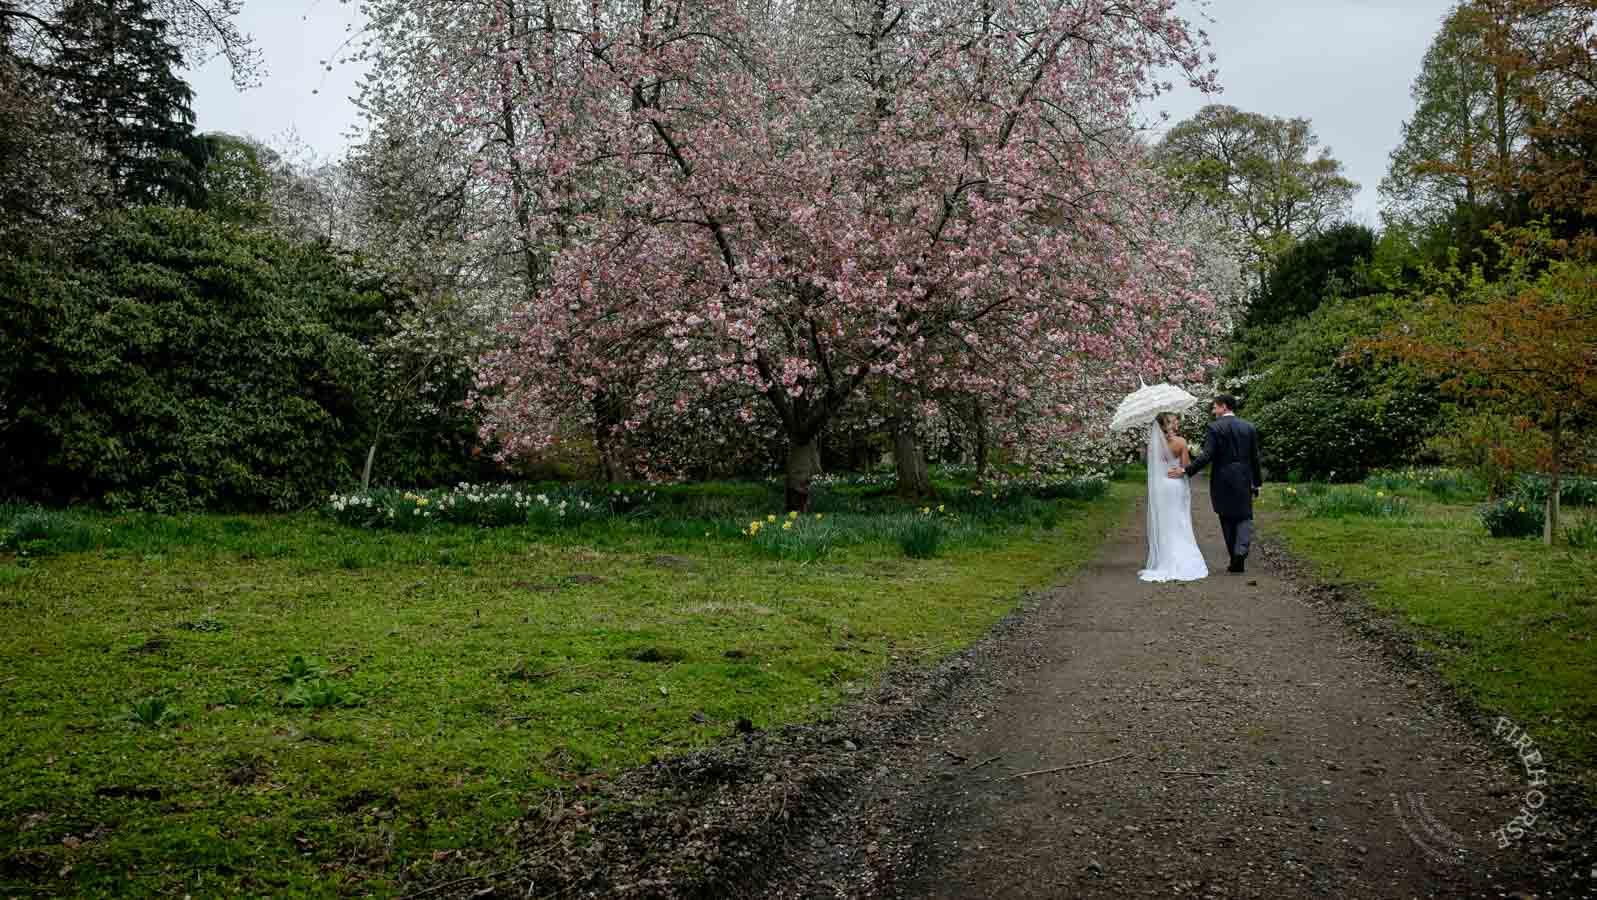 Swinton-Park-Spring-Wedding-239